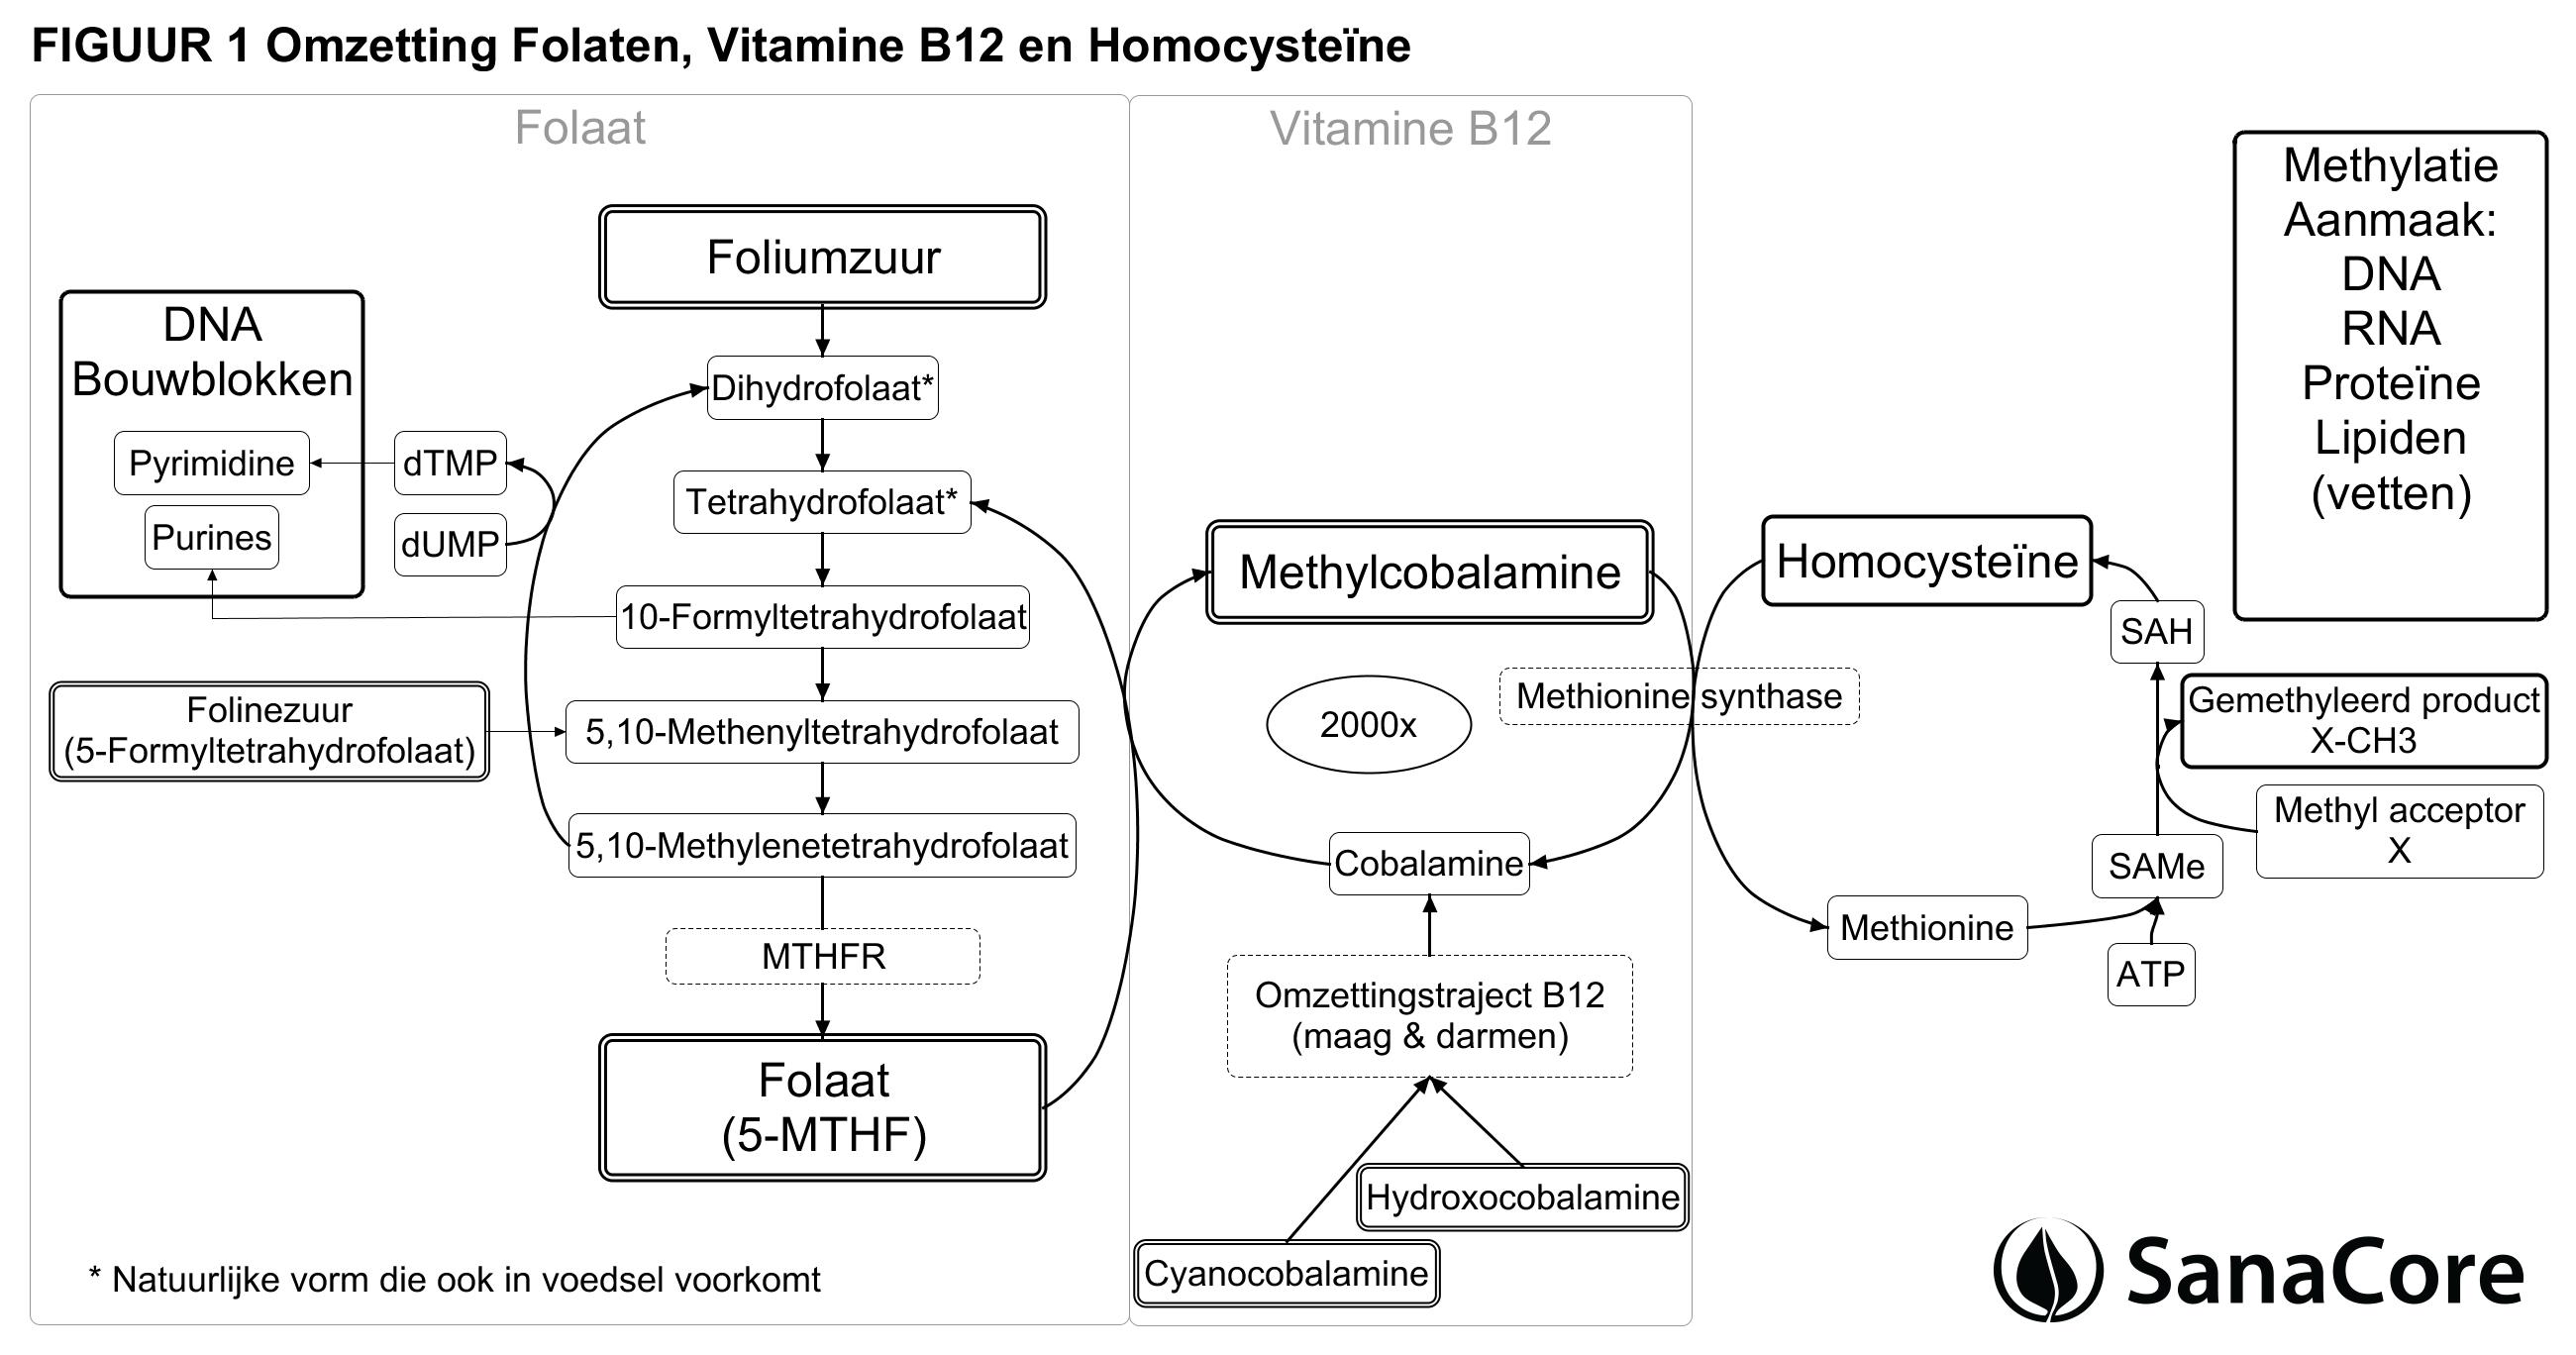 https://vitamineb12tekort.nl/img/omzetting_folaat_vitamineb12_homocyteine_methylatie.png